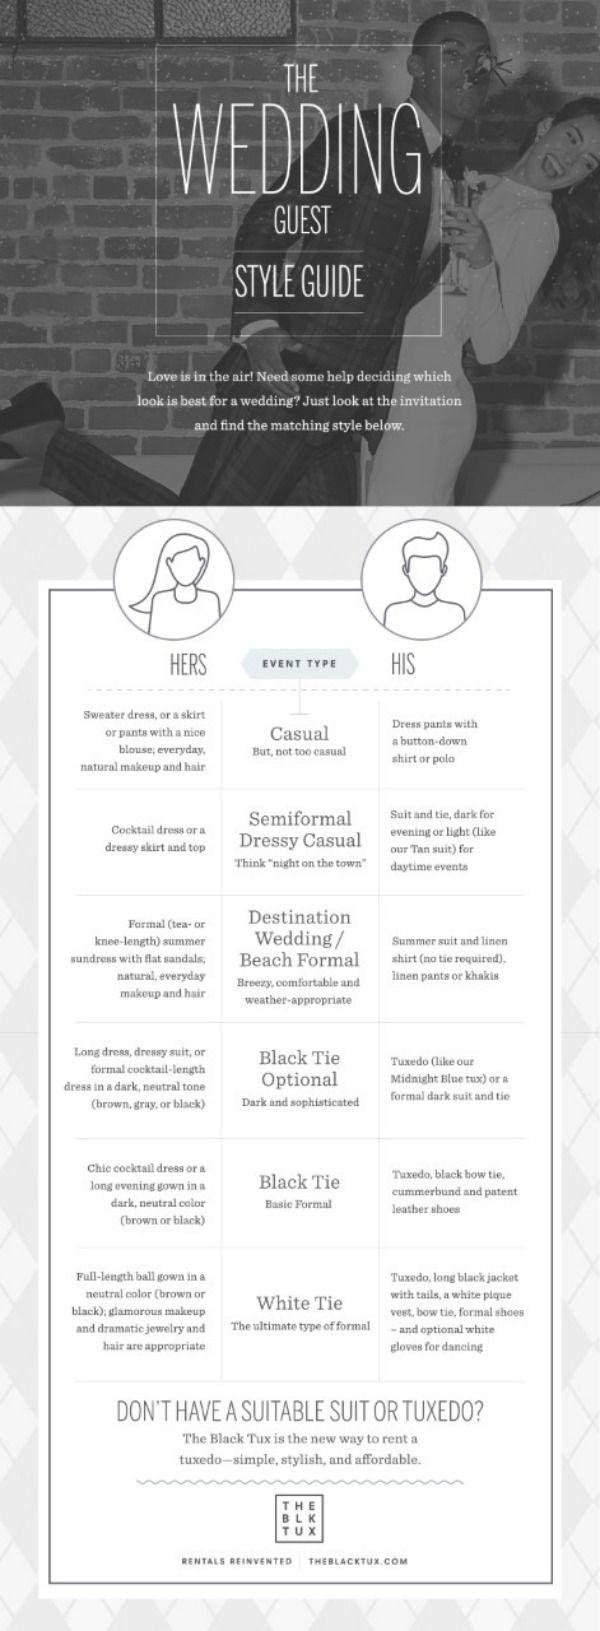 Wedding Dress Code Etiquette with The Black Tux Dreamery